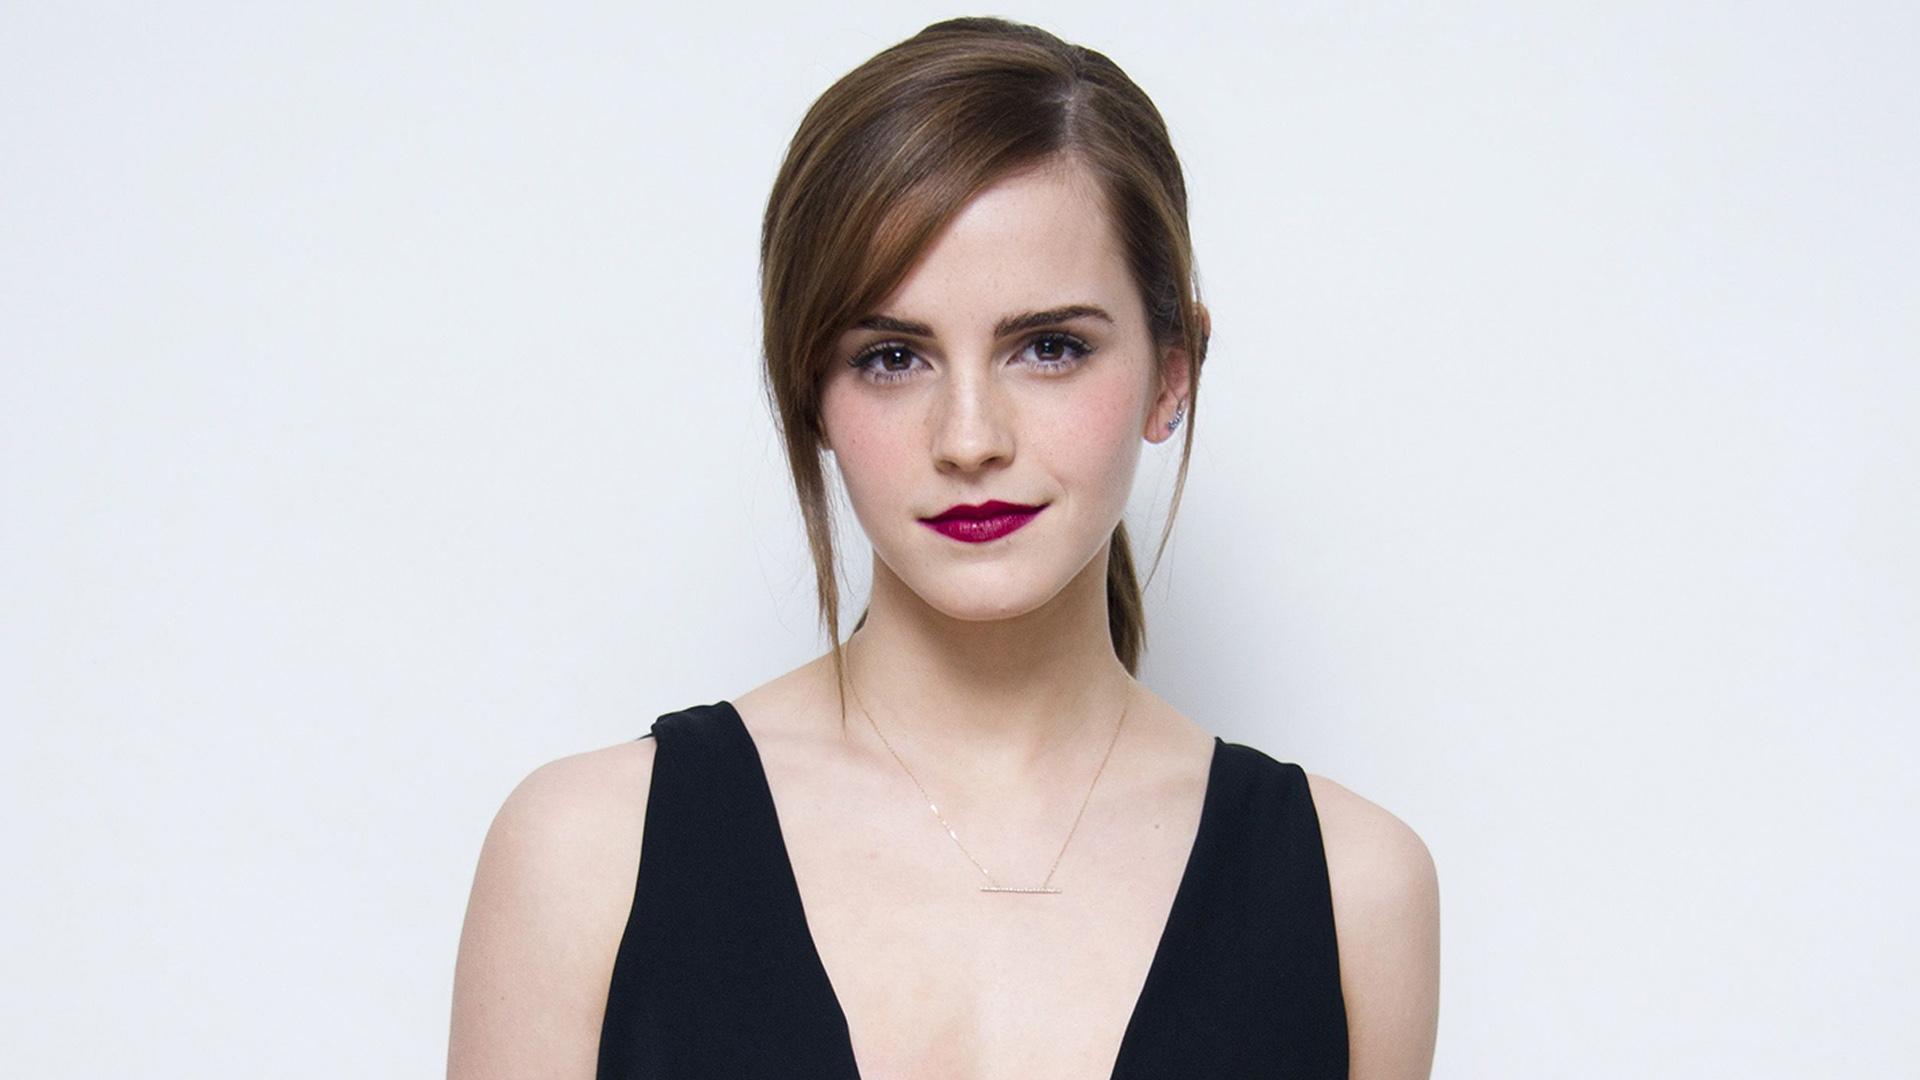 Emma Watson 655926 Wallpapers High Quality